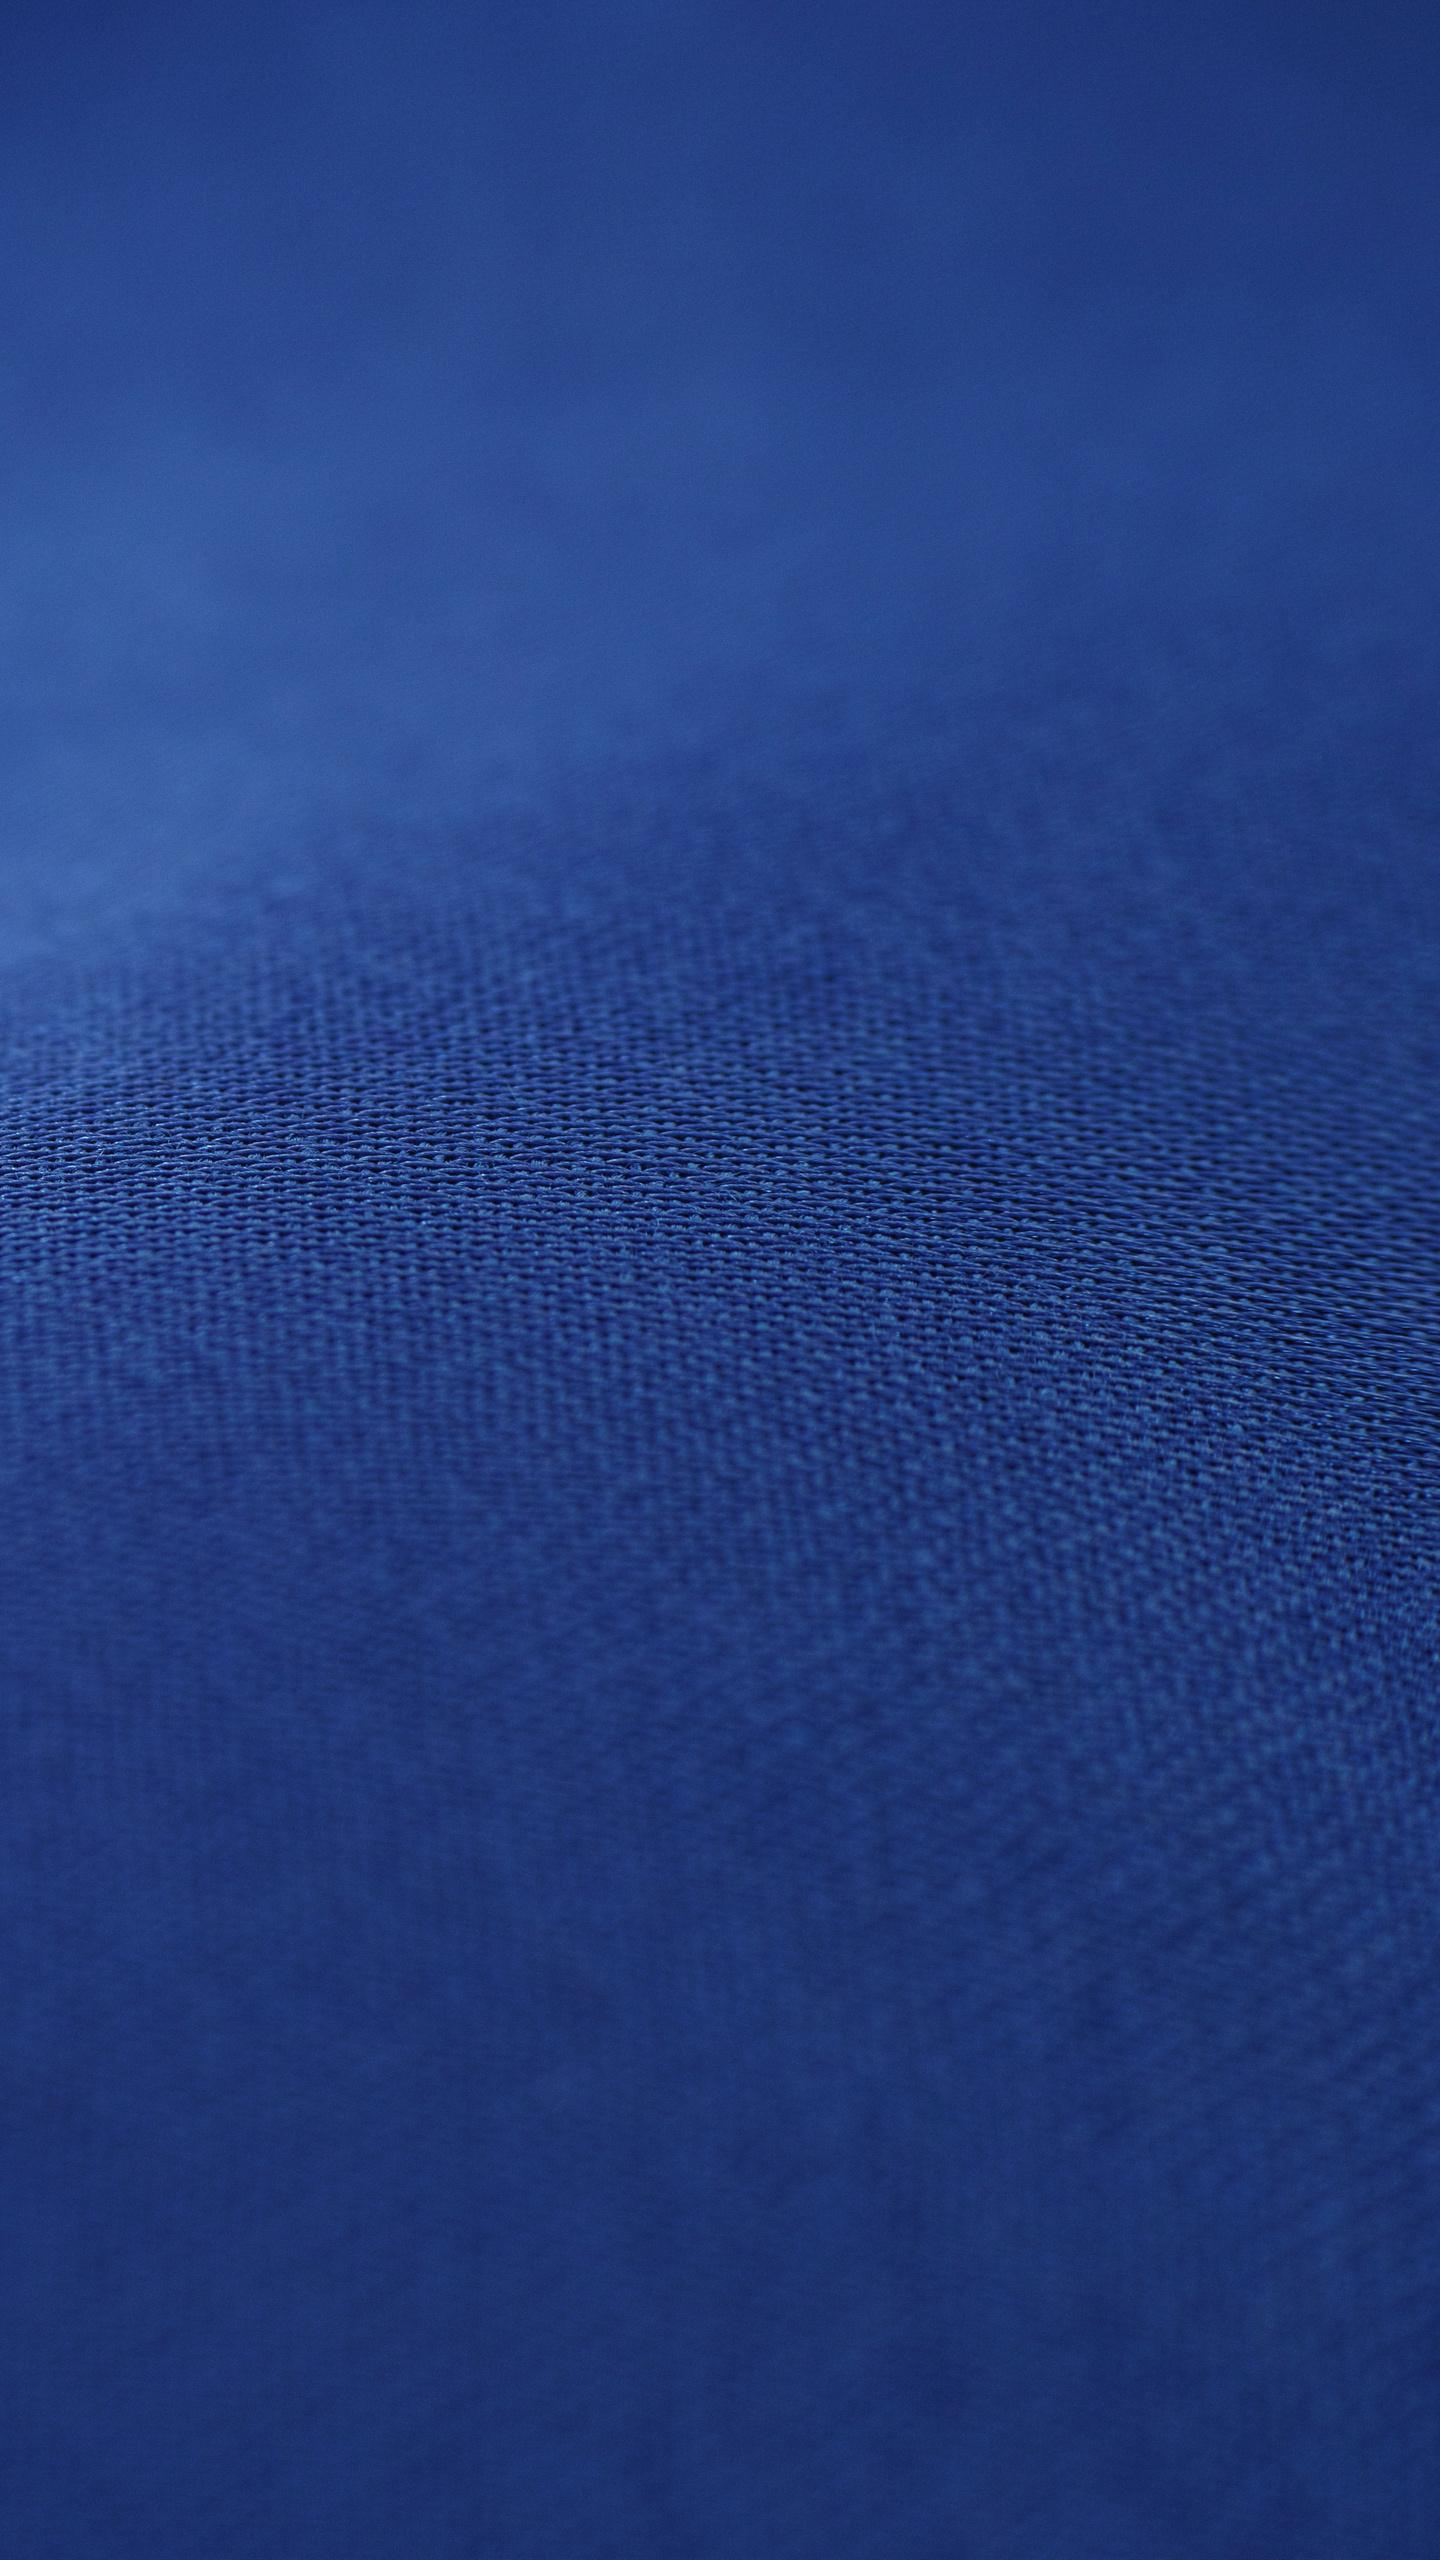 blue-fabric-pattern-8k-4x.jpg